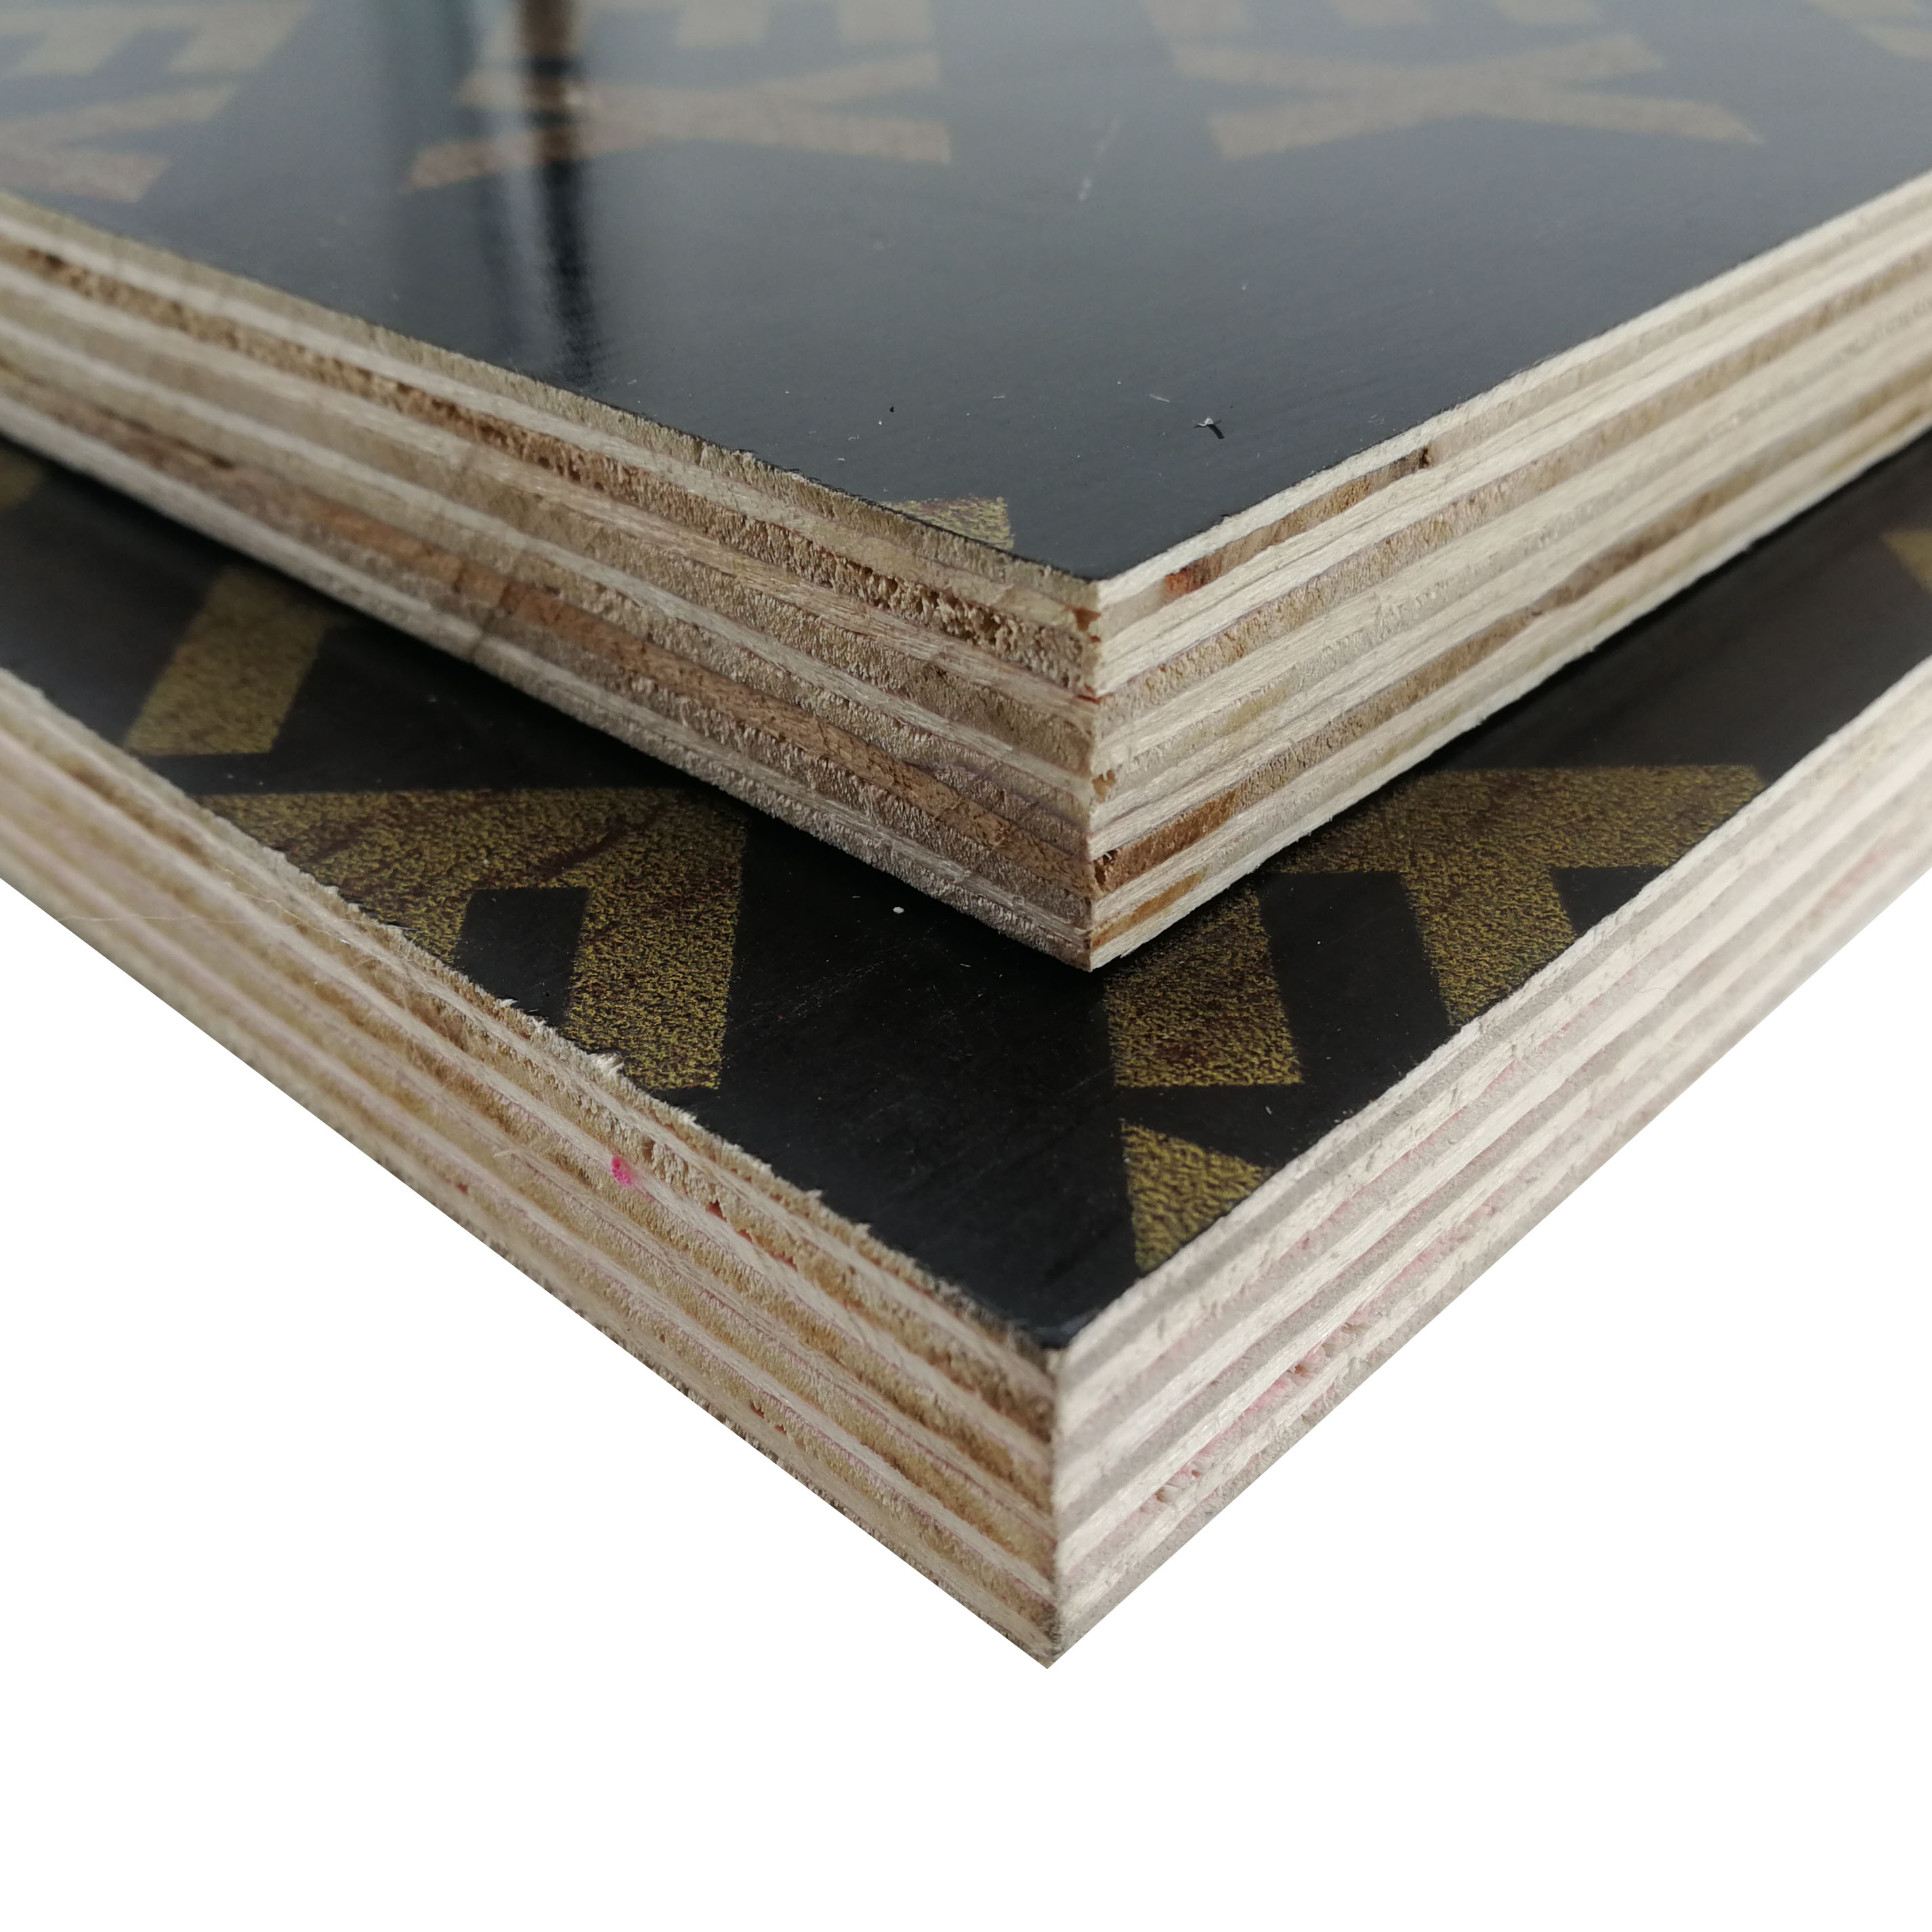 Harga Triplek Laut Kedap Air 3 4 Triplek Laut Filipina Buy Film Faced Plywood Harga Film Faced Plywood 18mm 3 4 Marine Kayu Lapis Product On Alibaba Com Harga plywood tahan air